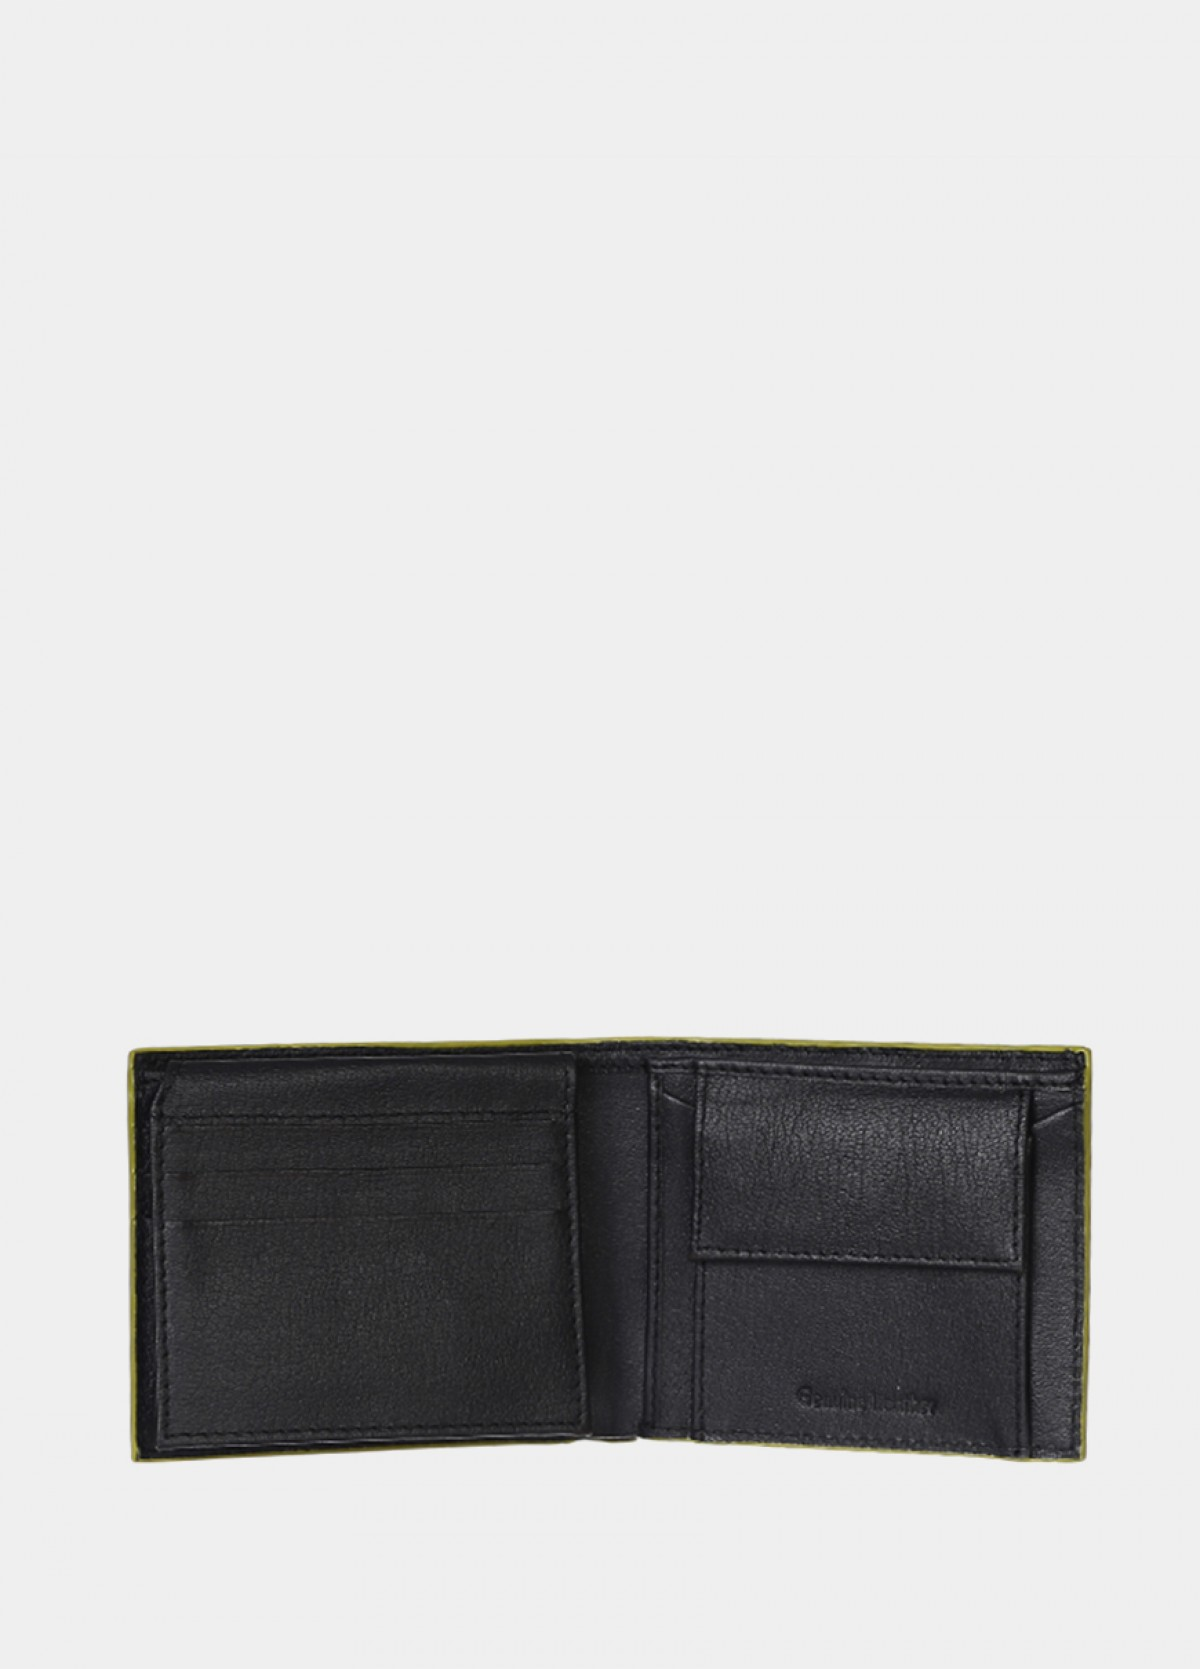 The Black Men Wallet